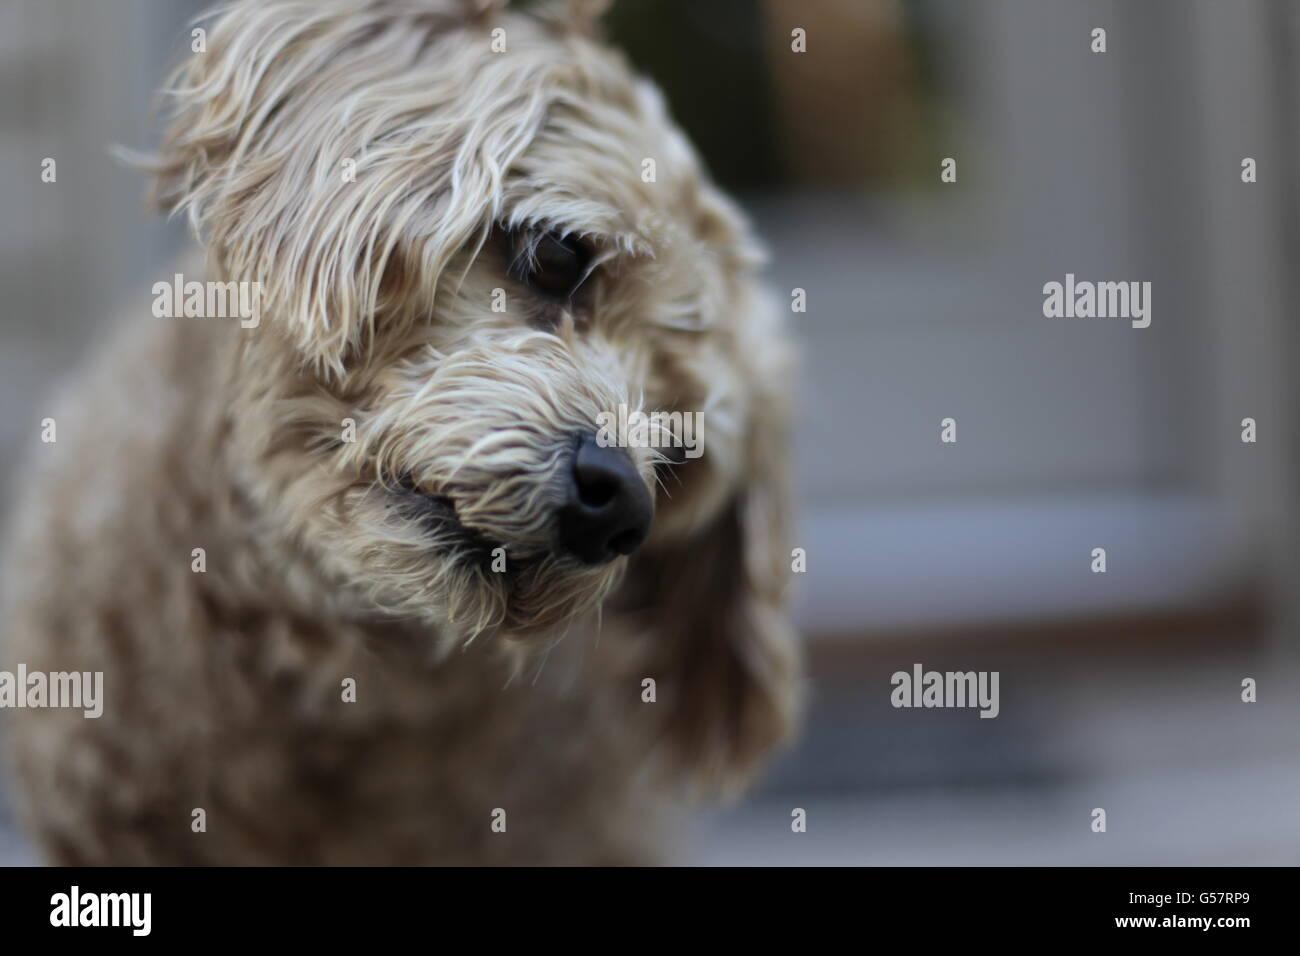 cute golden Cockapoo dog tilting head - Stock Image